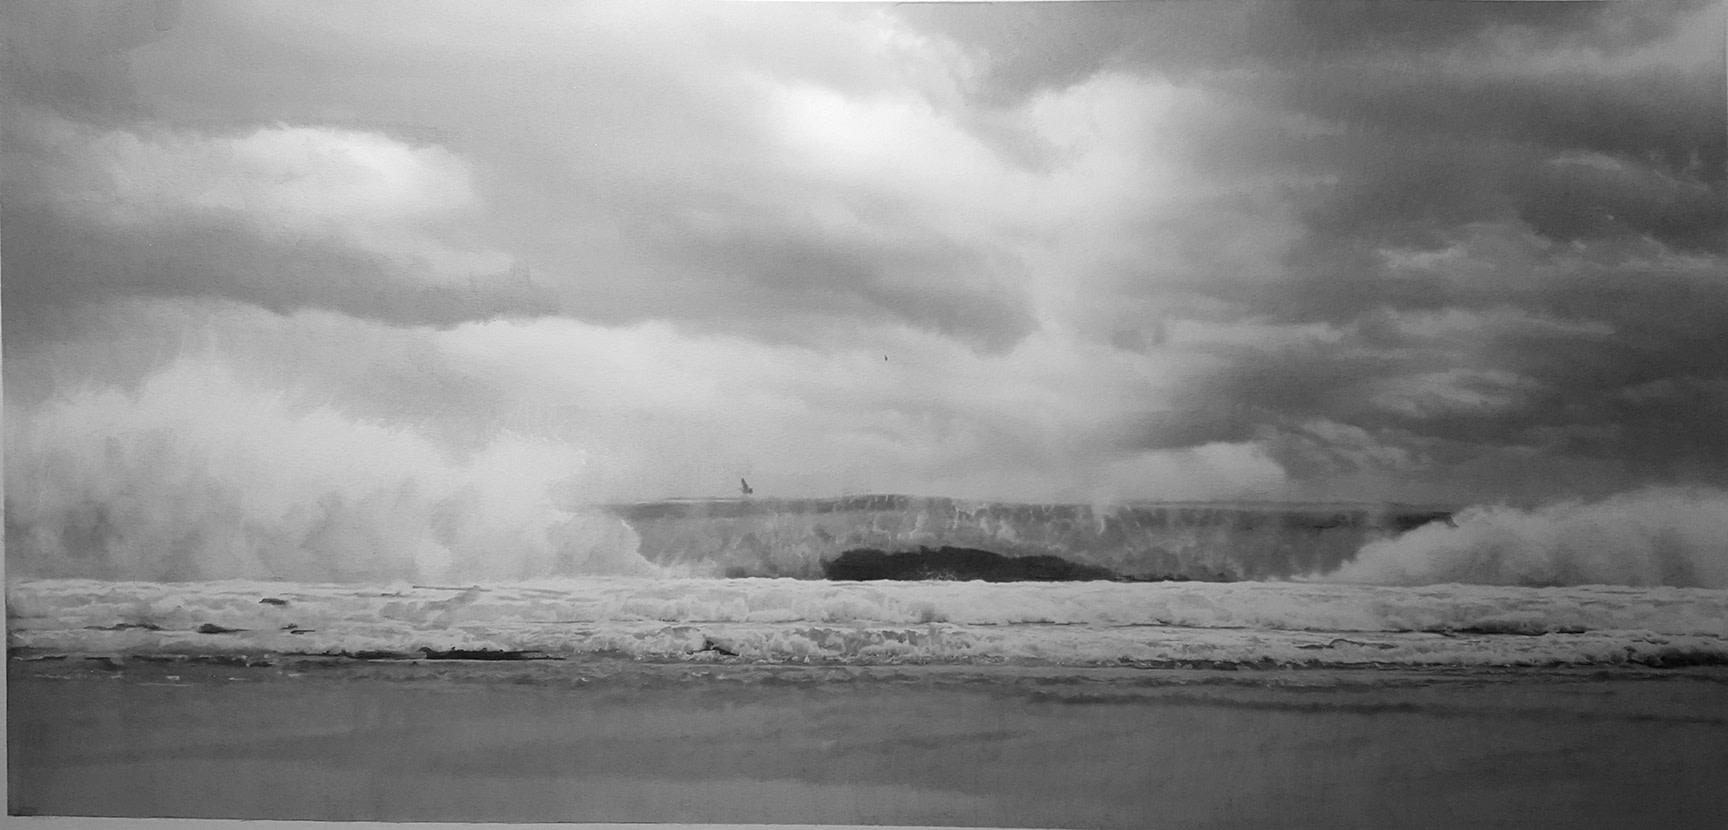 <span class=&#34;link fancybox-details-link&#34;><a href=&#34;/artists/77-paul-cadden/works/2212/&#34;>View Detail Page</a></span><div class=&#34;artist&#34;><strong>Paul Cadden</strong></div> <div class=&#34;title&#34;><em>Tangasdale Beach</em></div> <div class=&#34;medium&#34;>Pencil on Paper</div> <div class=&#34;dimensions&#34;>73cm x 36cm</div><div class=&#34;copyright_line&#34;>Copyright The Artist</div>